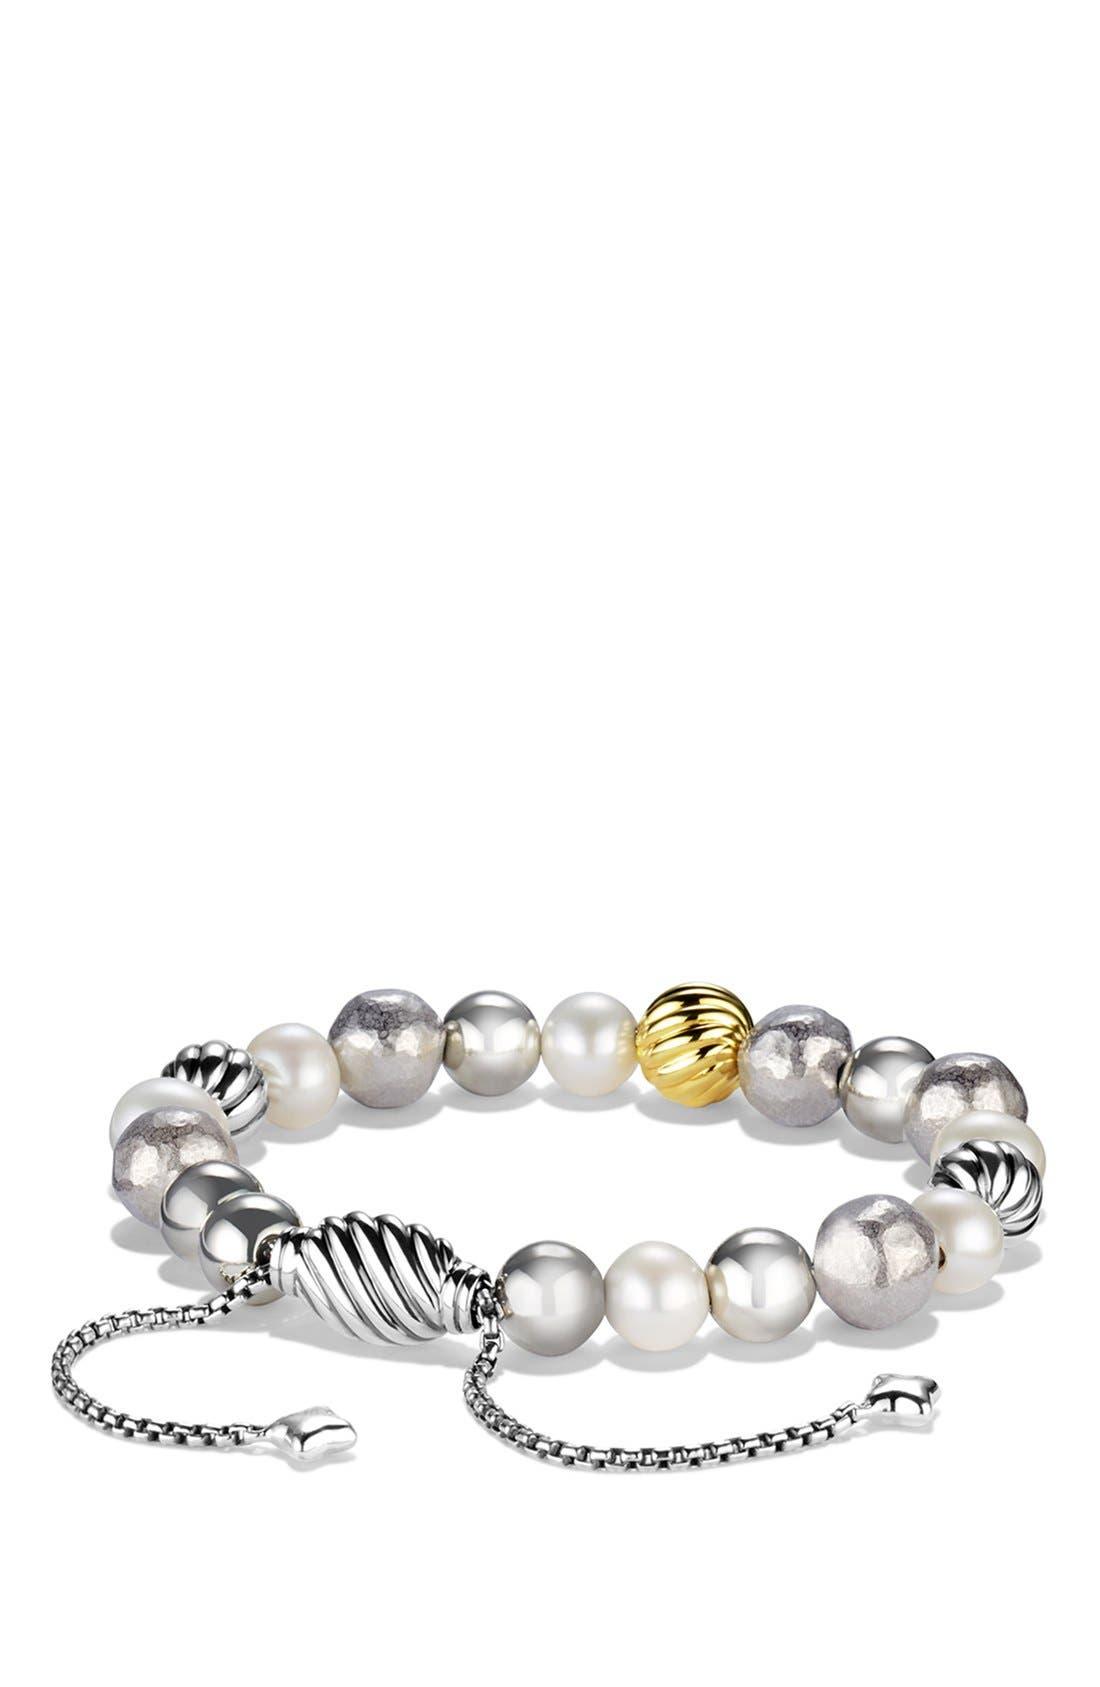 Main Image - David Yurman 'DY Elements' Bracelet with Gold